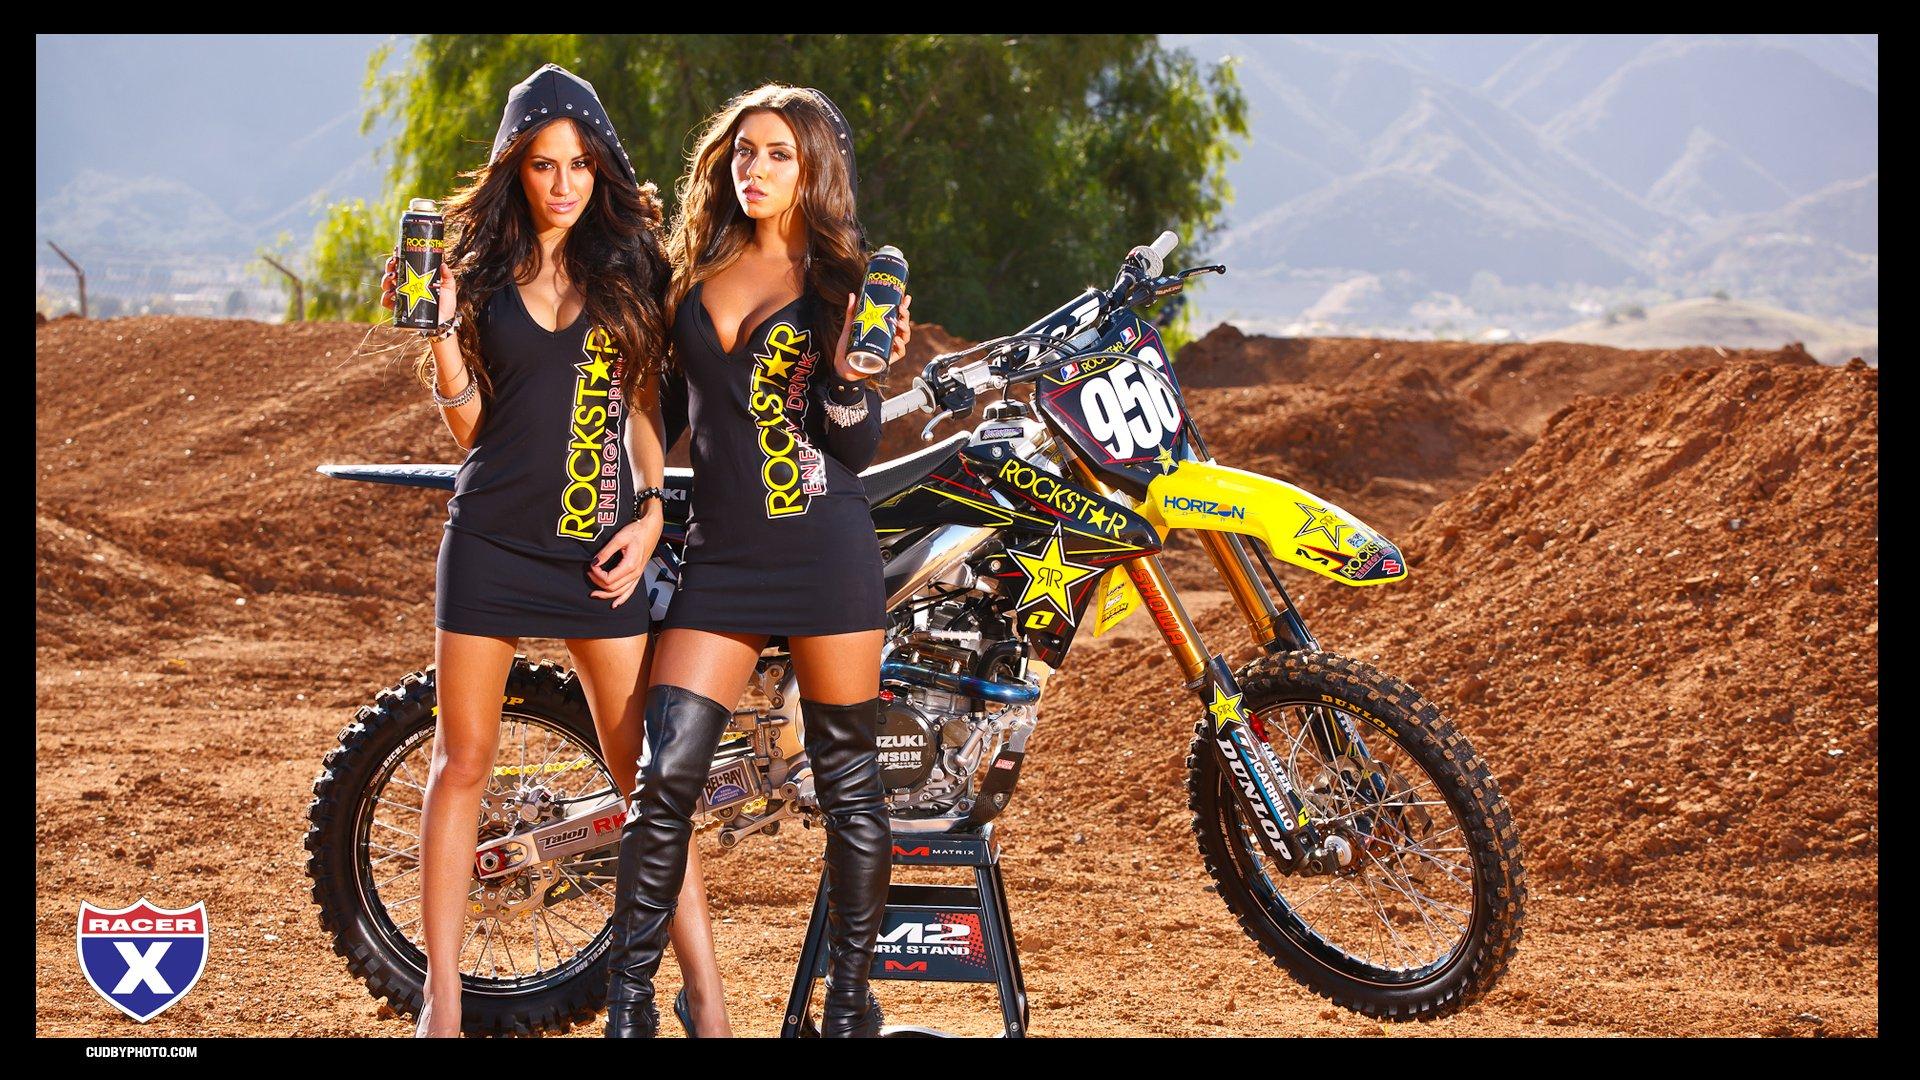 Motocross Girls Wallpaper Rockstar girls 1920x1080